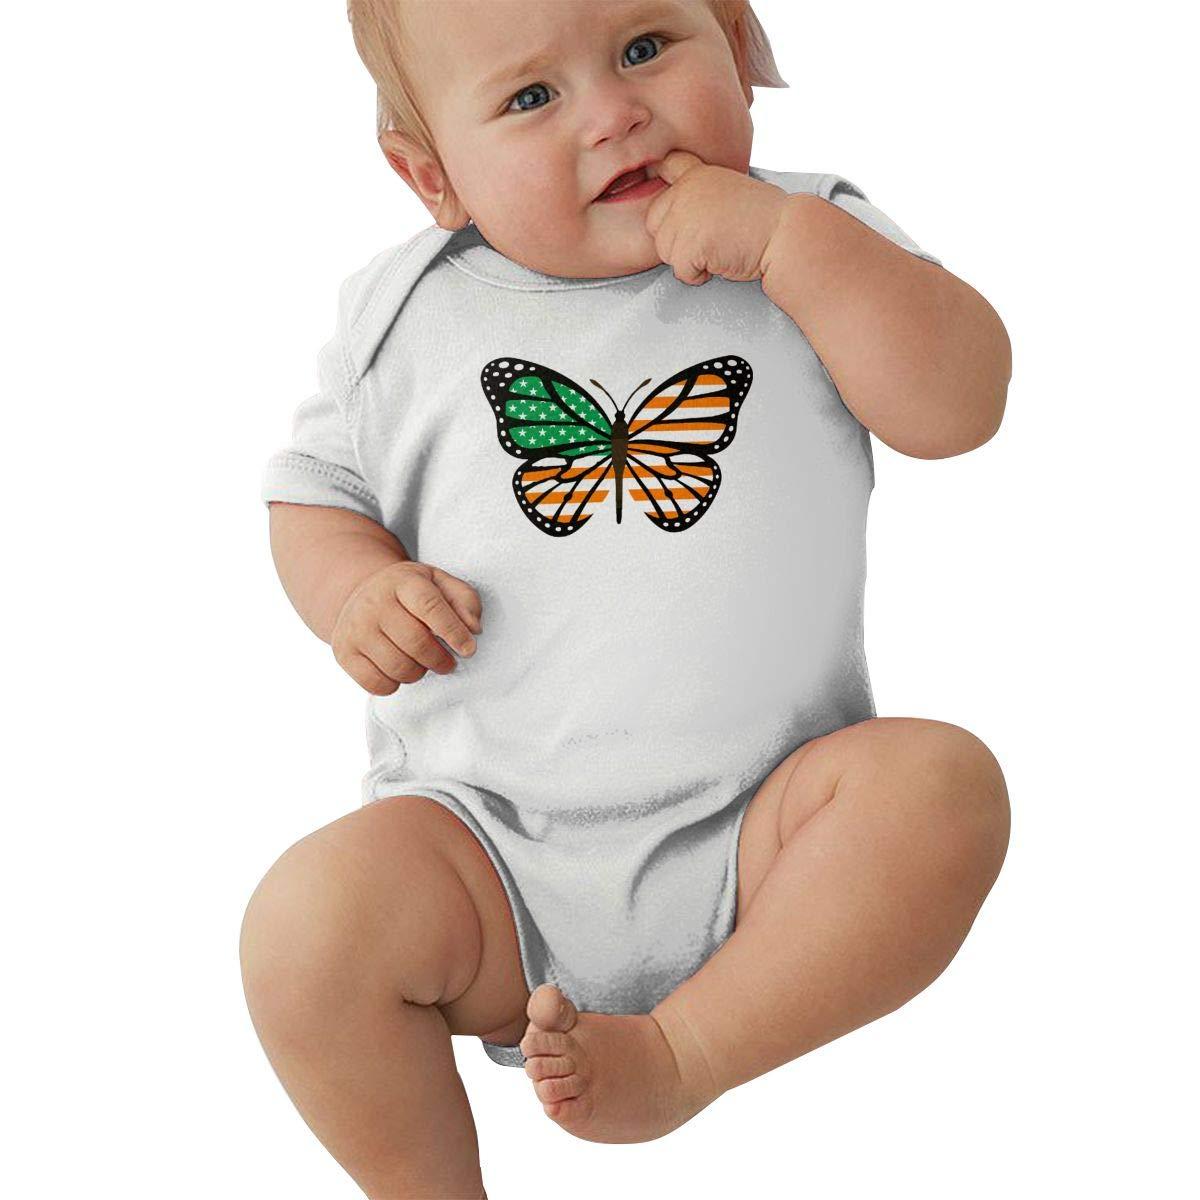 Mri-le2 Toddler Baby Boy Girl Short Sleeve Organic Bodysuits ButterFlag Irish Flag of USA Baby Rompers